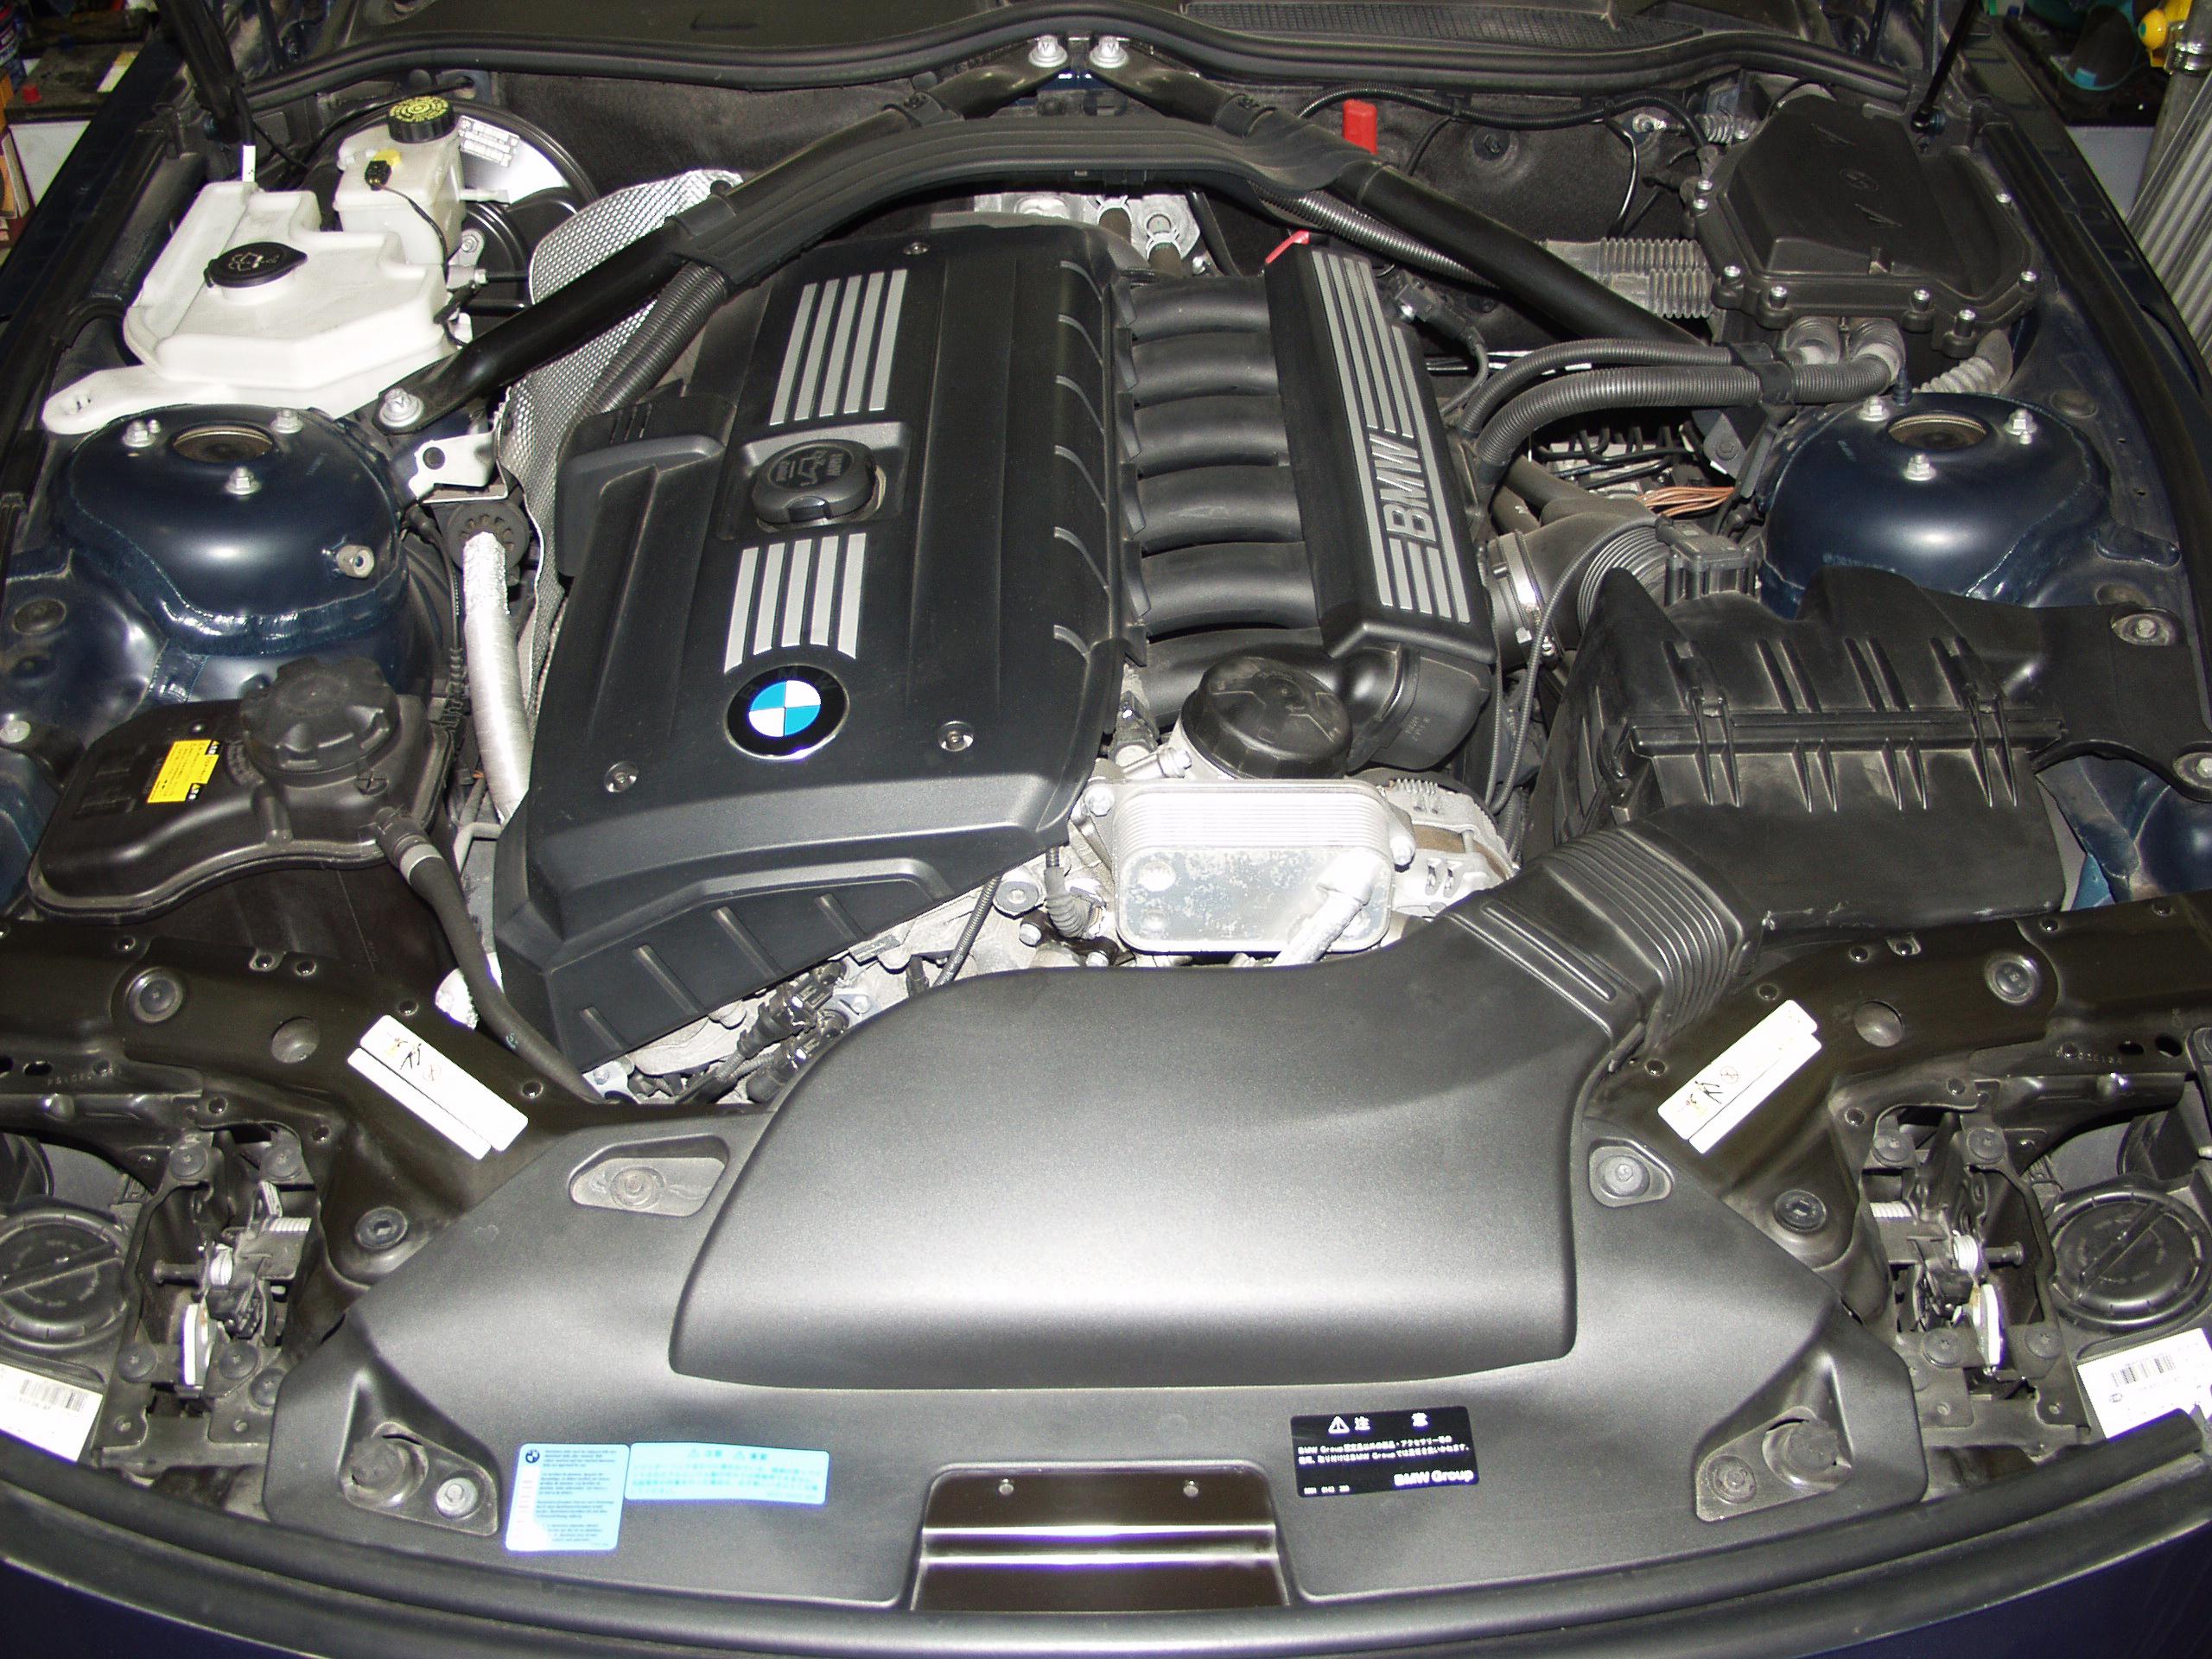 BMW E89 Z4 2.5L直列6気筒エンジンはパワフルです。